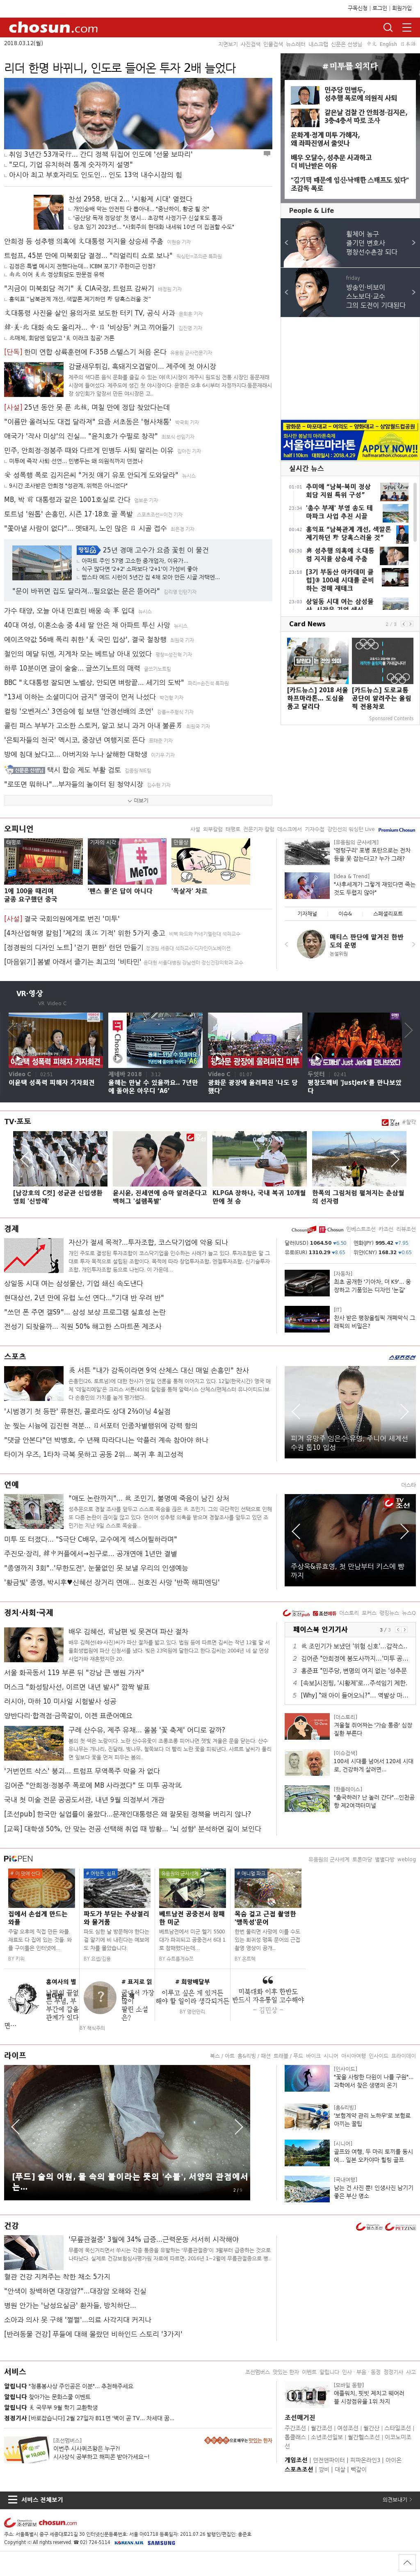 chosun.com at Monday March 12, 2018, 1:02 a.m. UTC